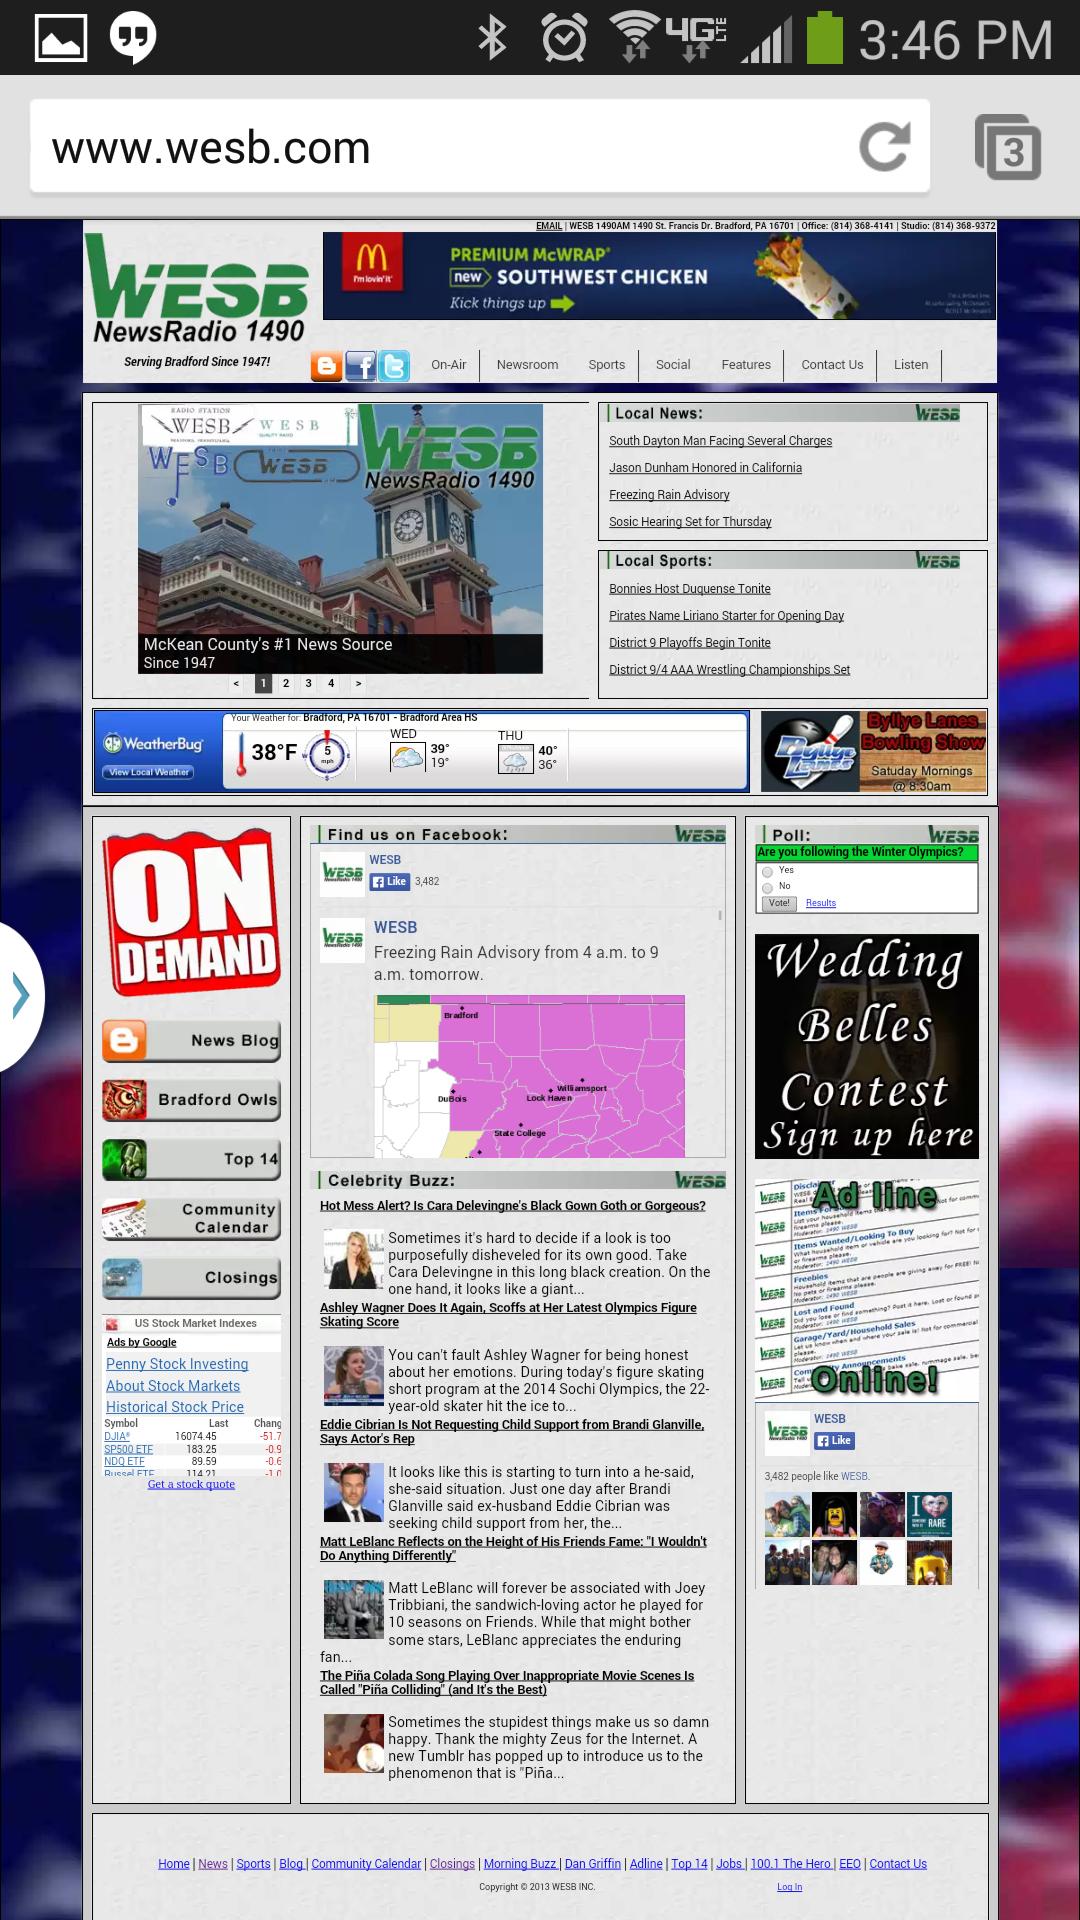 Screenshot_2014-02-19-15-46-09